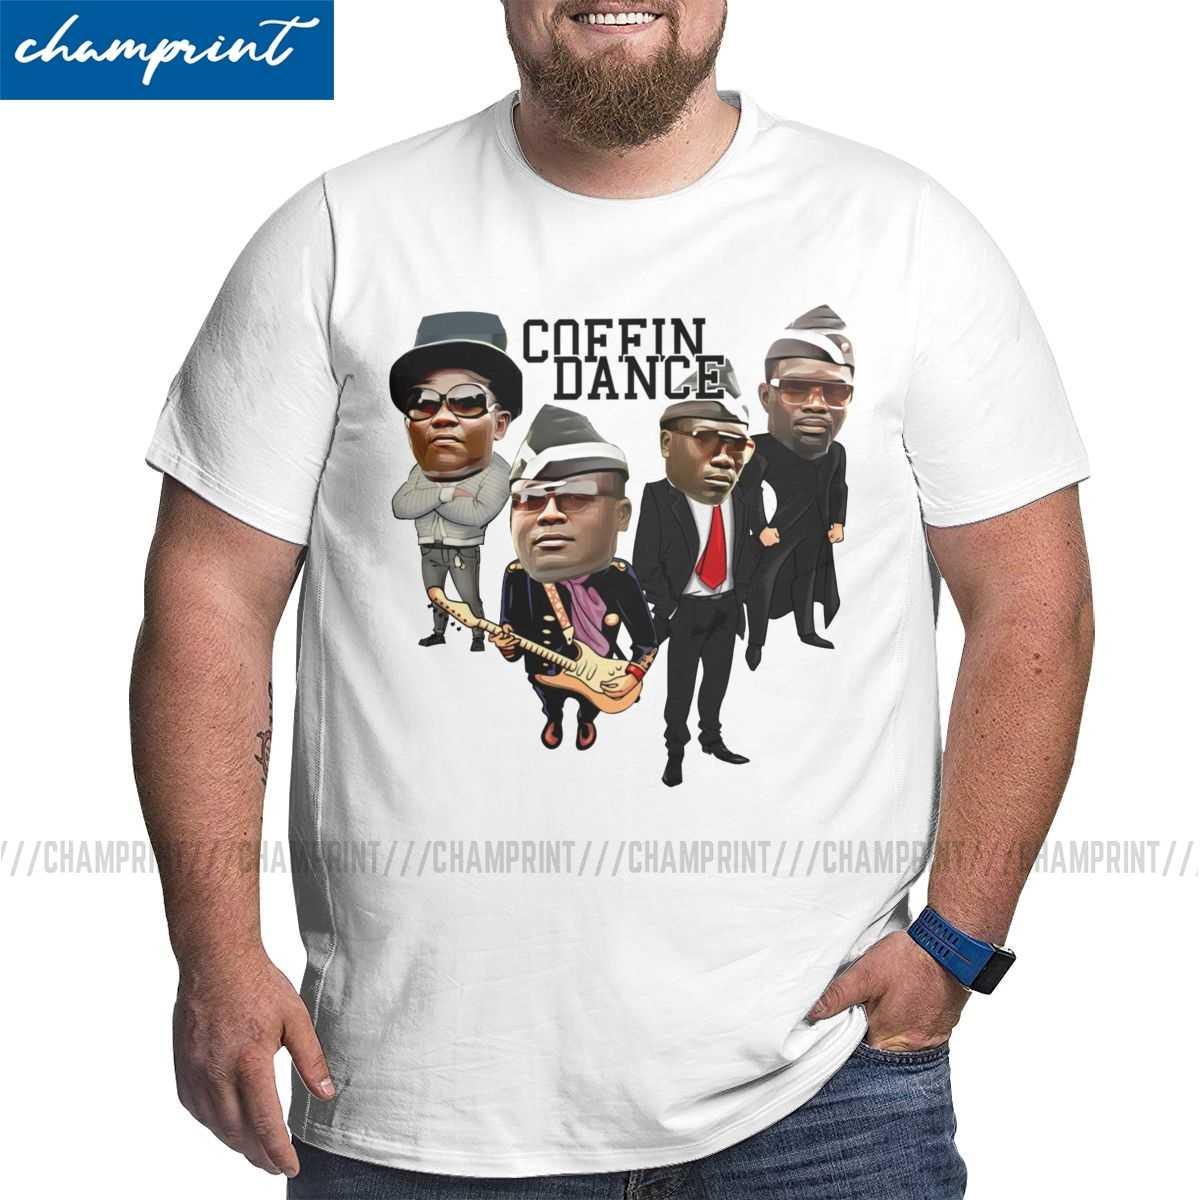 Men S Coffin Dance Caricatur T Shirts 2020 Funny Meme T Shirts Funeral Dance With Casket Pallbearers Tops Vintage Big Tall Tees T Shirts Aliexpress